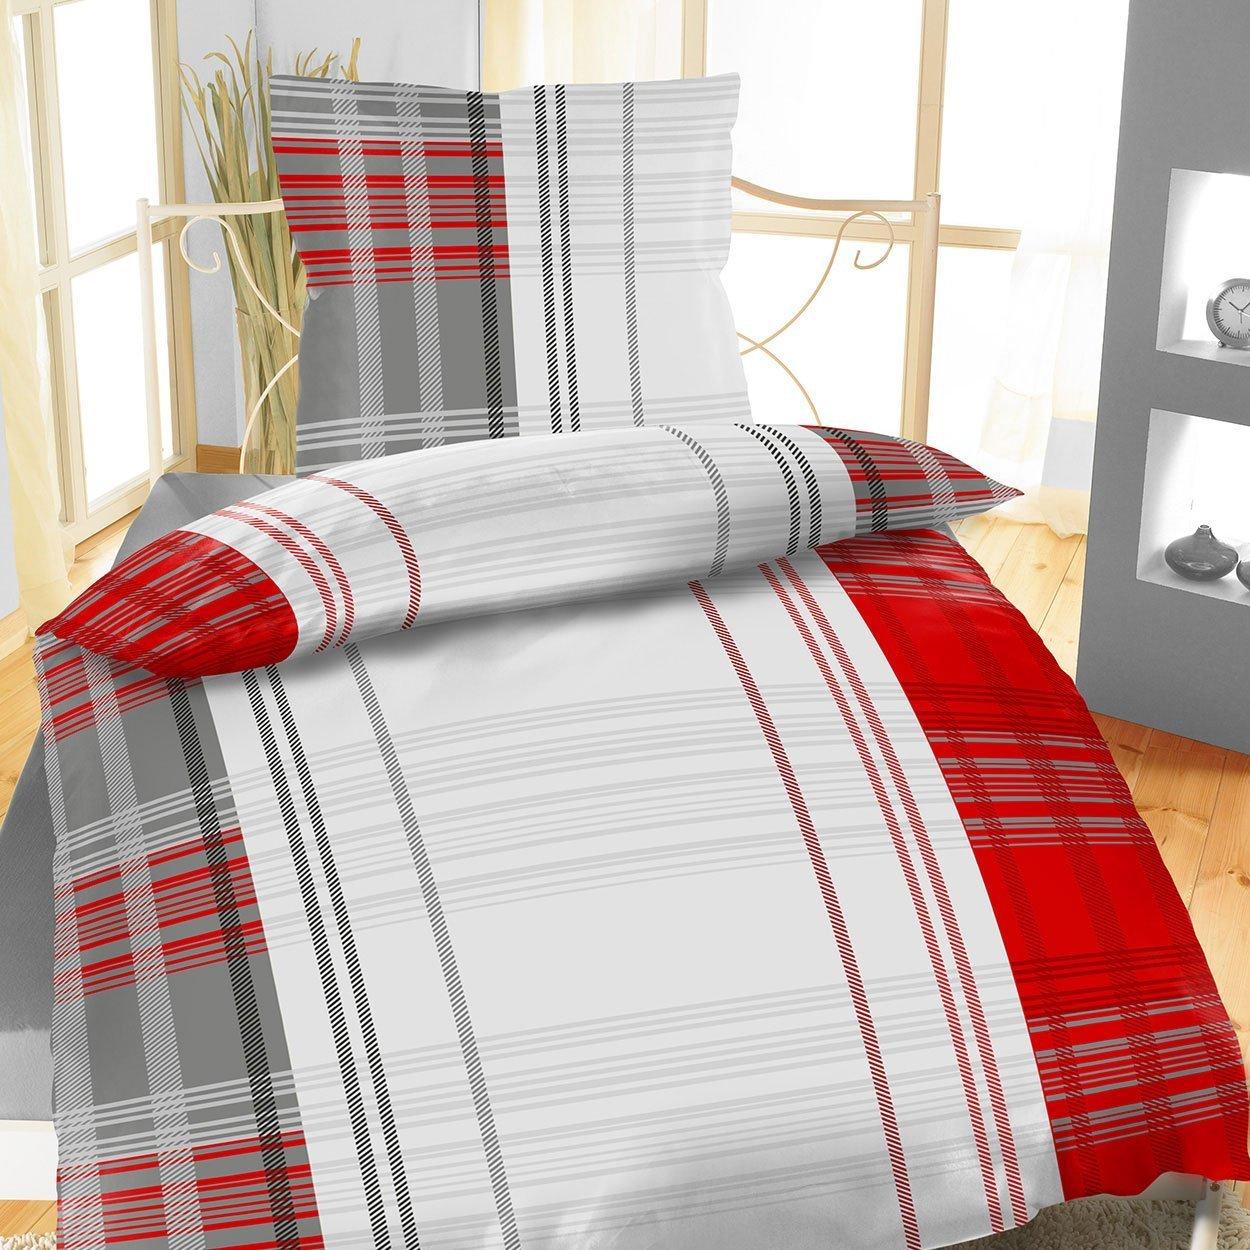 4tlg Warme Winter Bettwäsche Fleece Flausch 2X 135x200 + 2X 80 x80 Fahrhild B01LYIYU0Y Bettwsche-Sets